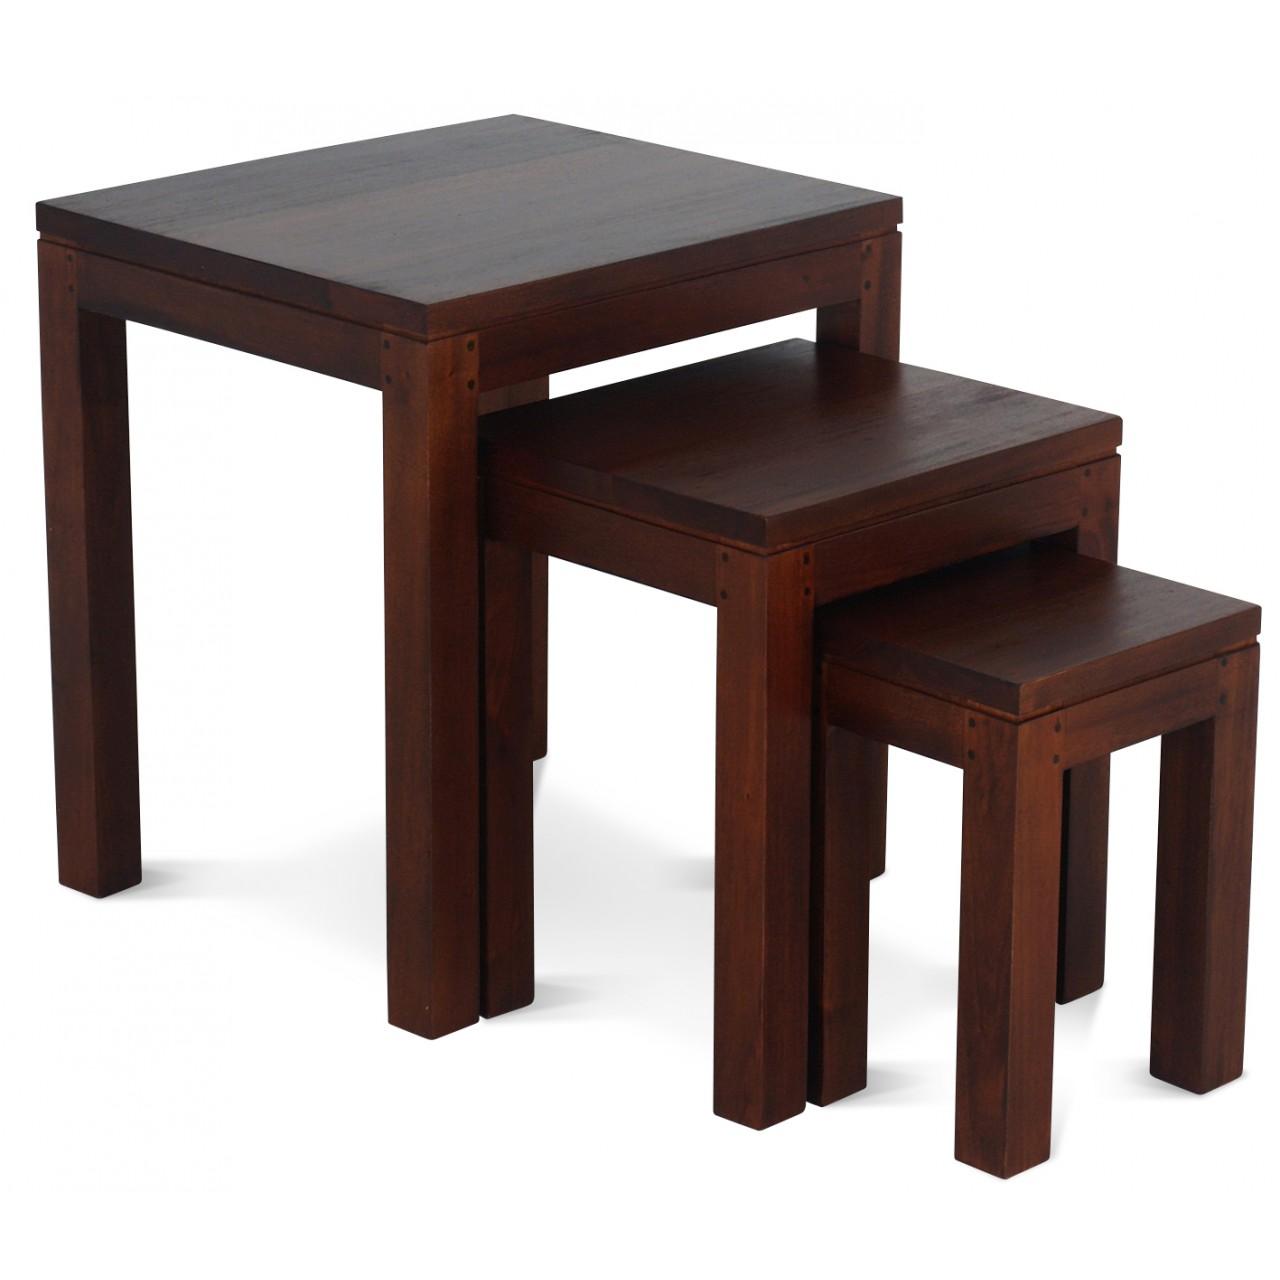 Direct Furniture Furniture Direct Visit Northwich Direct Furniture 28 Images Direct